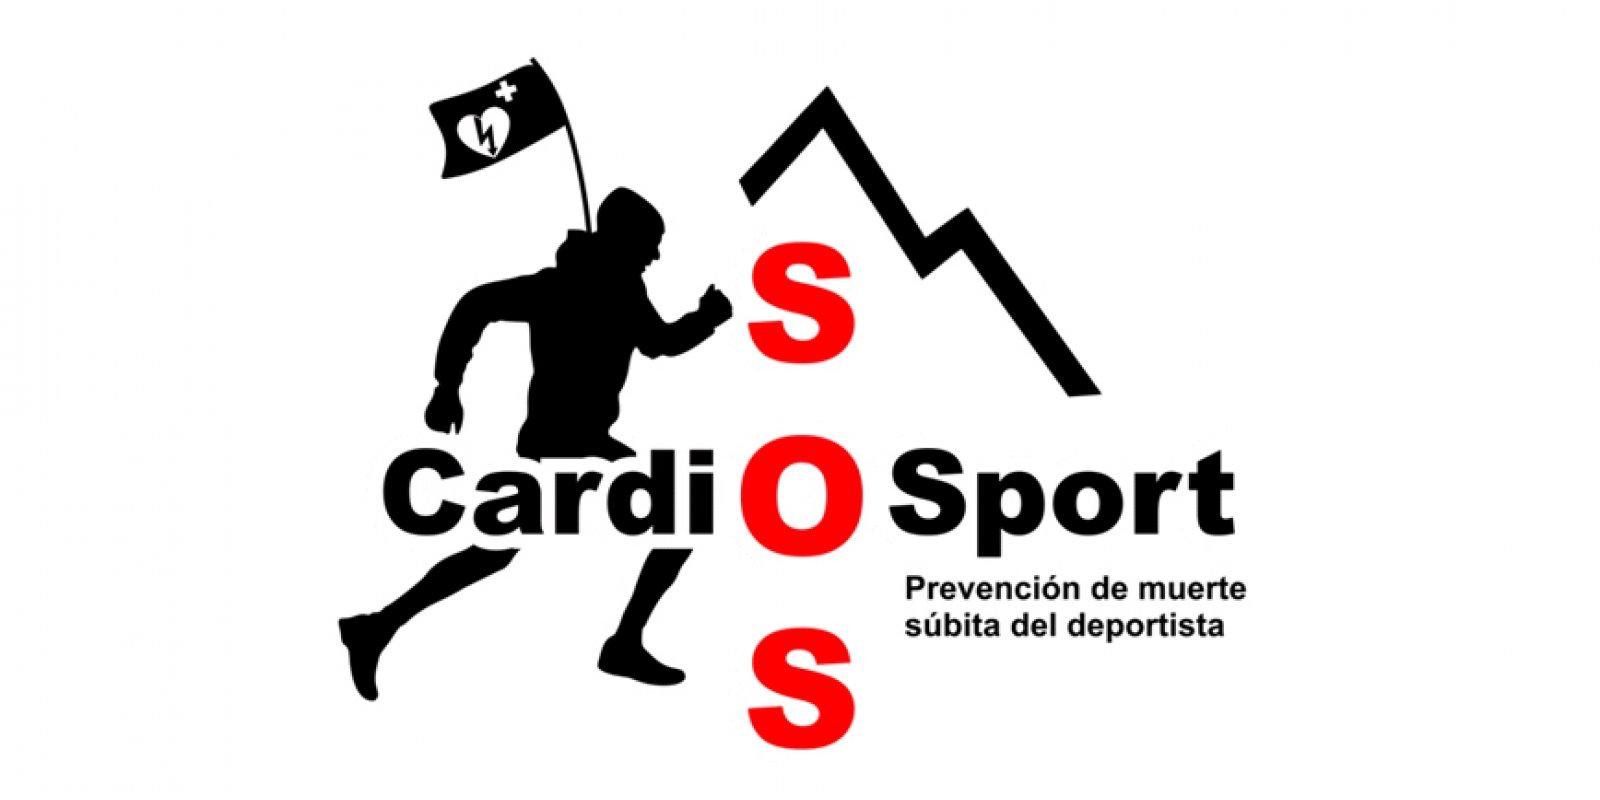 SOS Cardio Sport